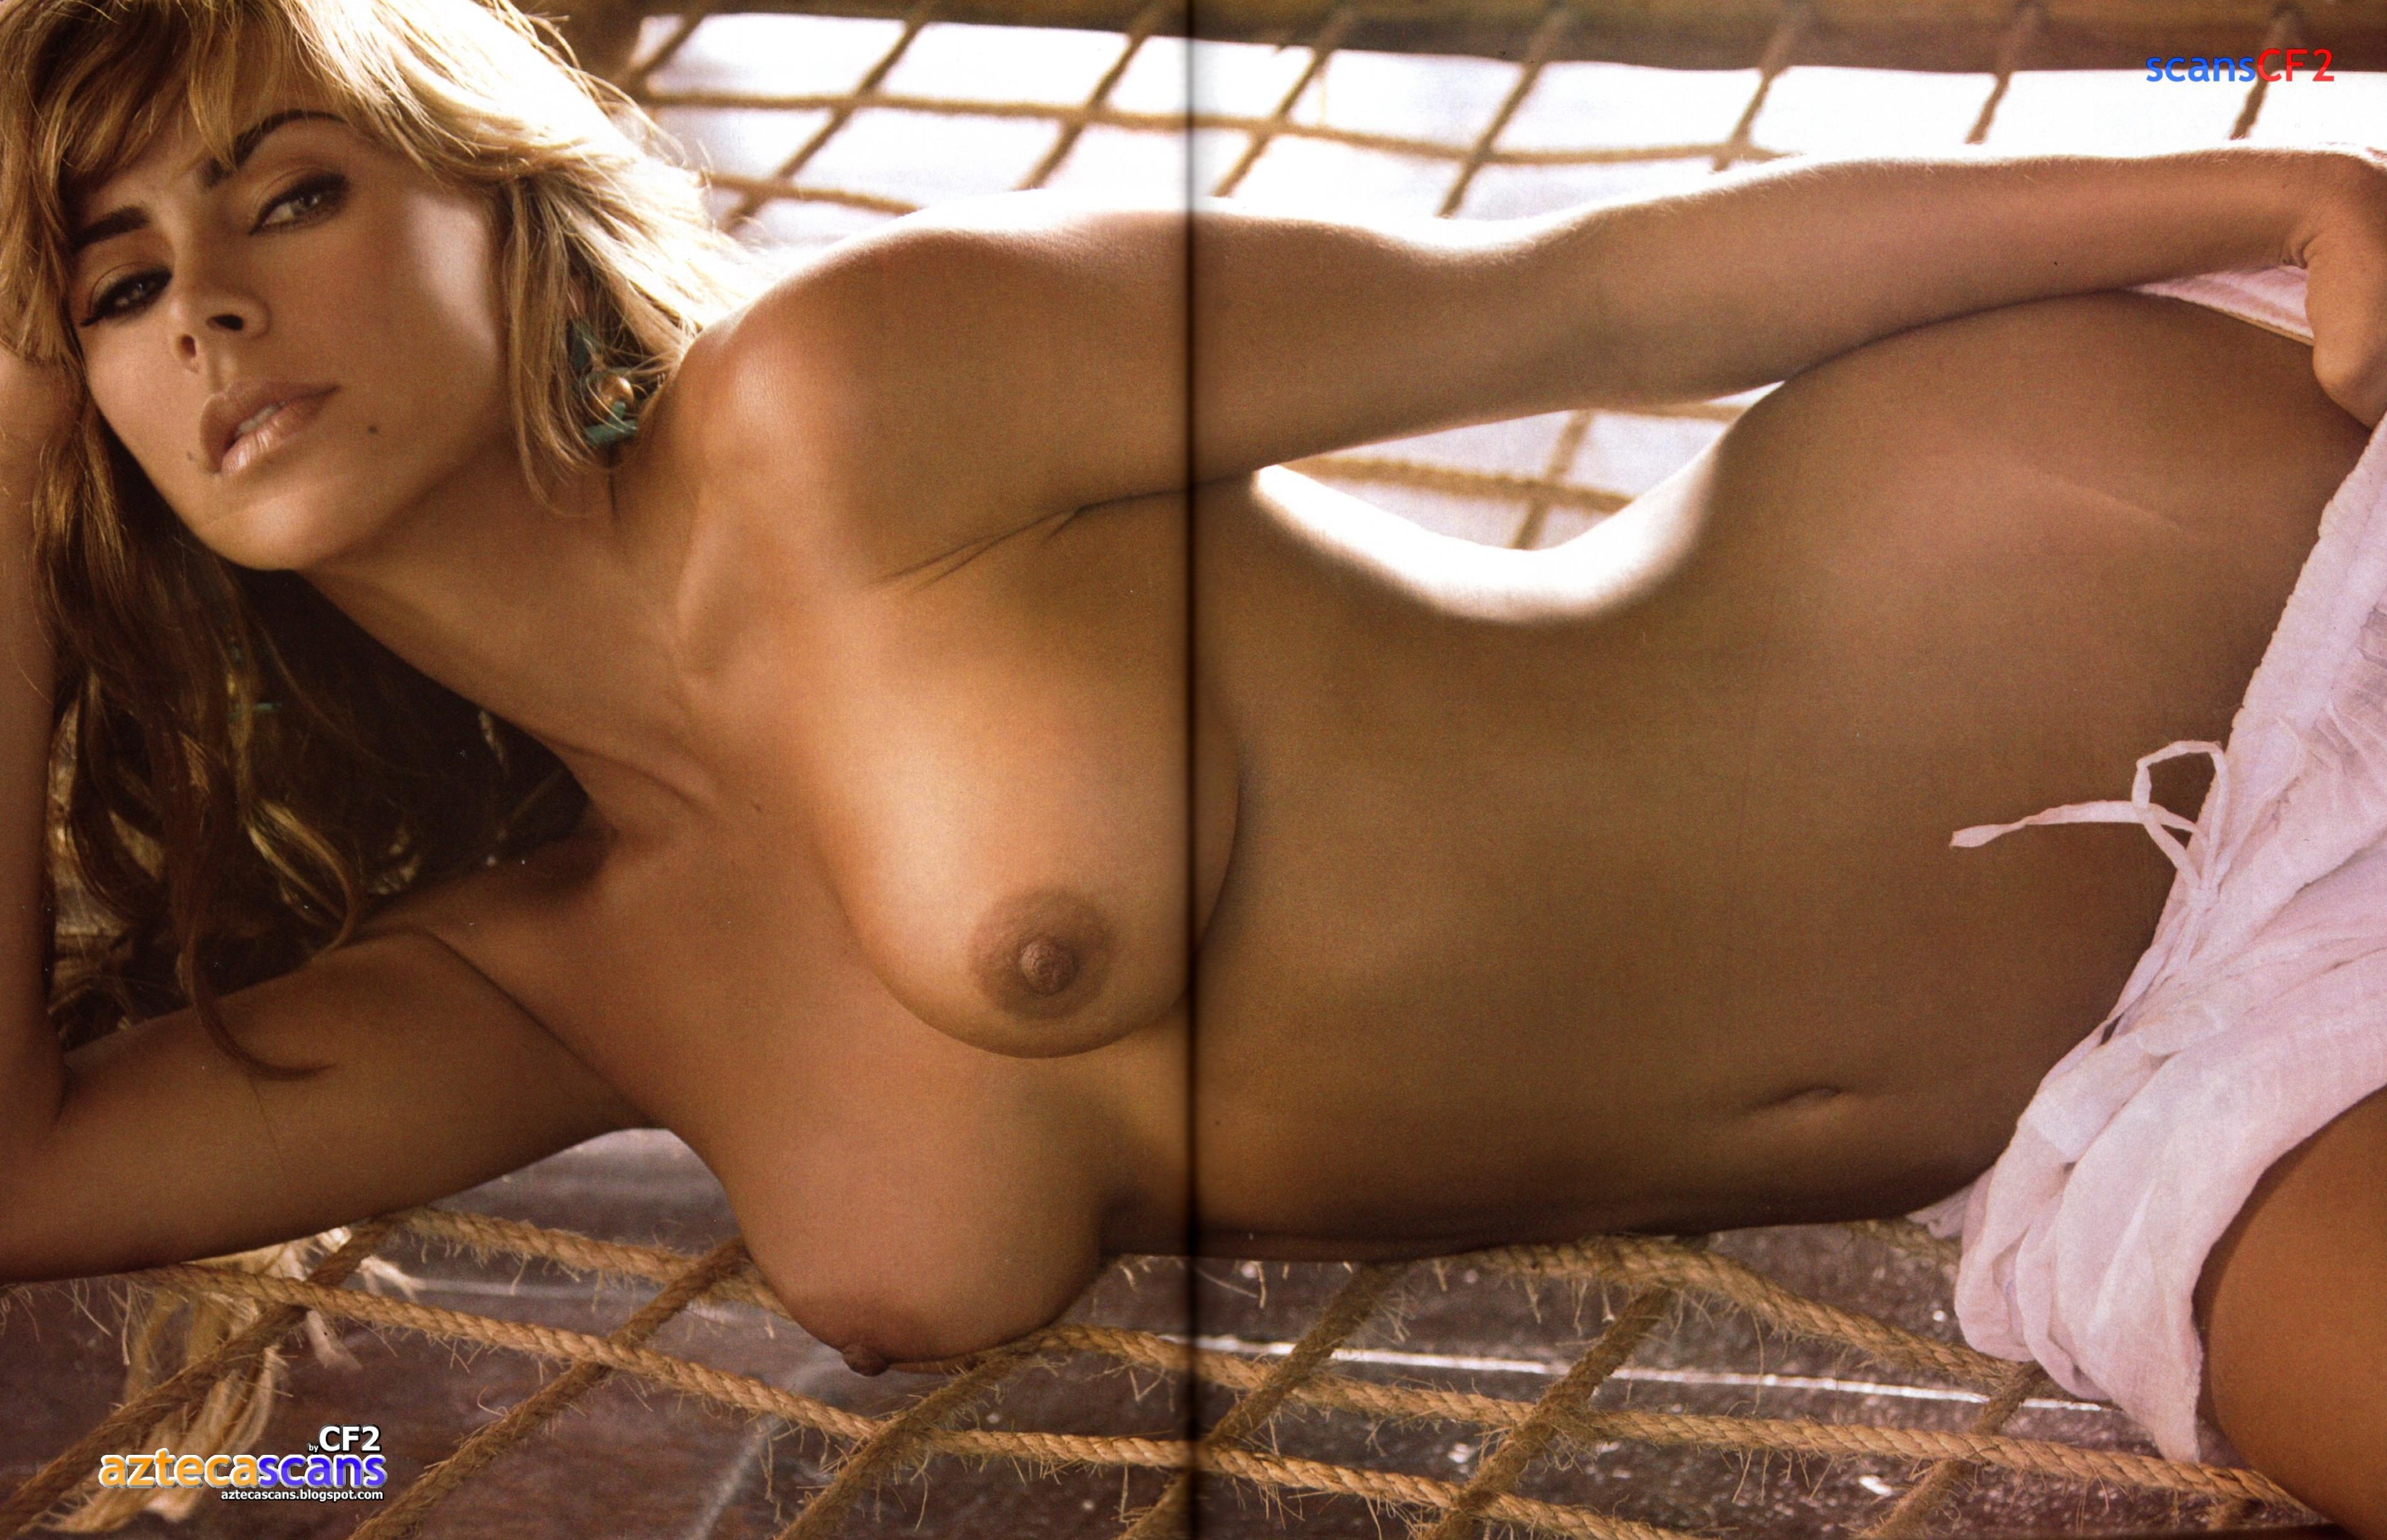 Naked pics of aylin mujica images 403